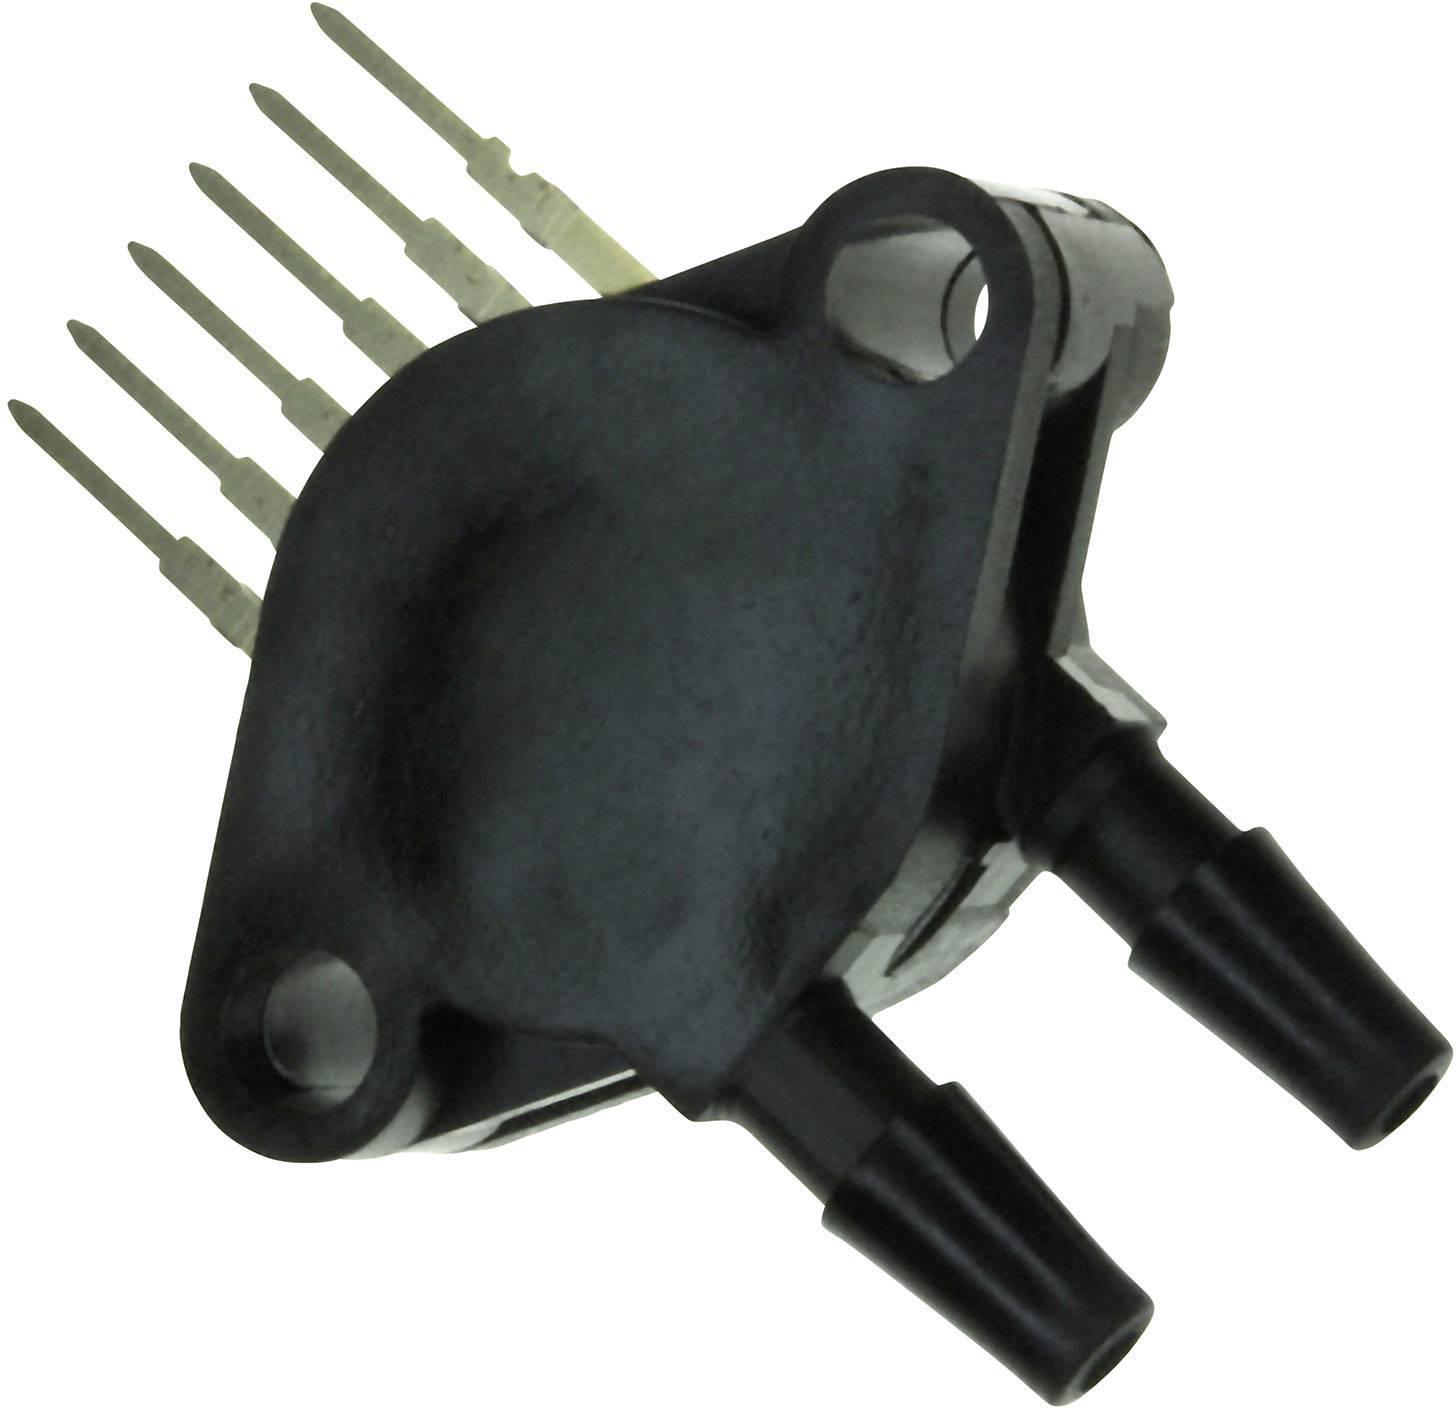 Senzor tlaku NXP Semiconductors MPX5010DP, 0 kPa až 10 kPa, do DPS